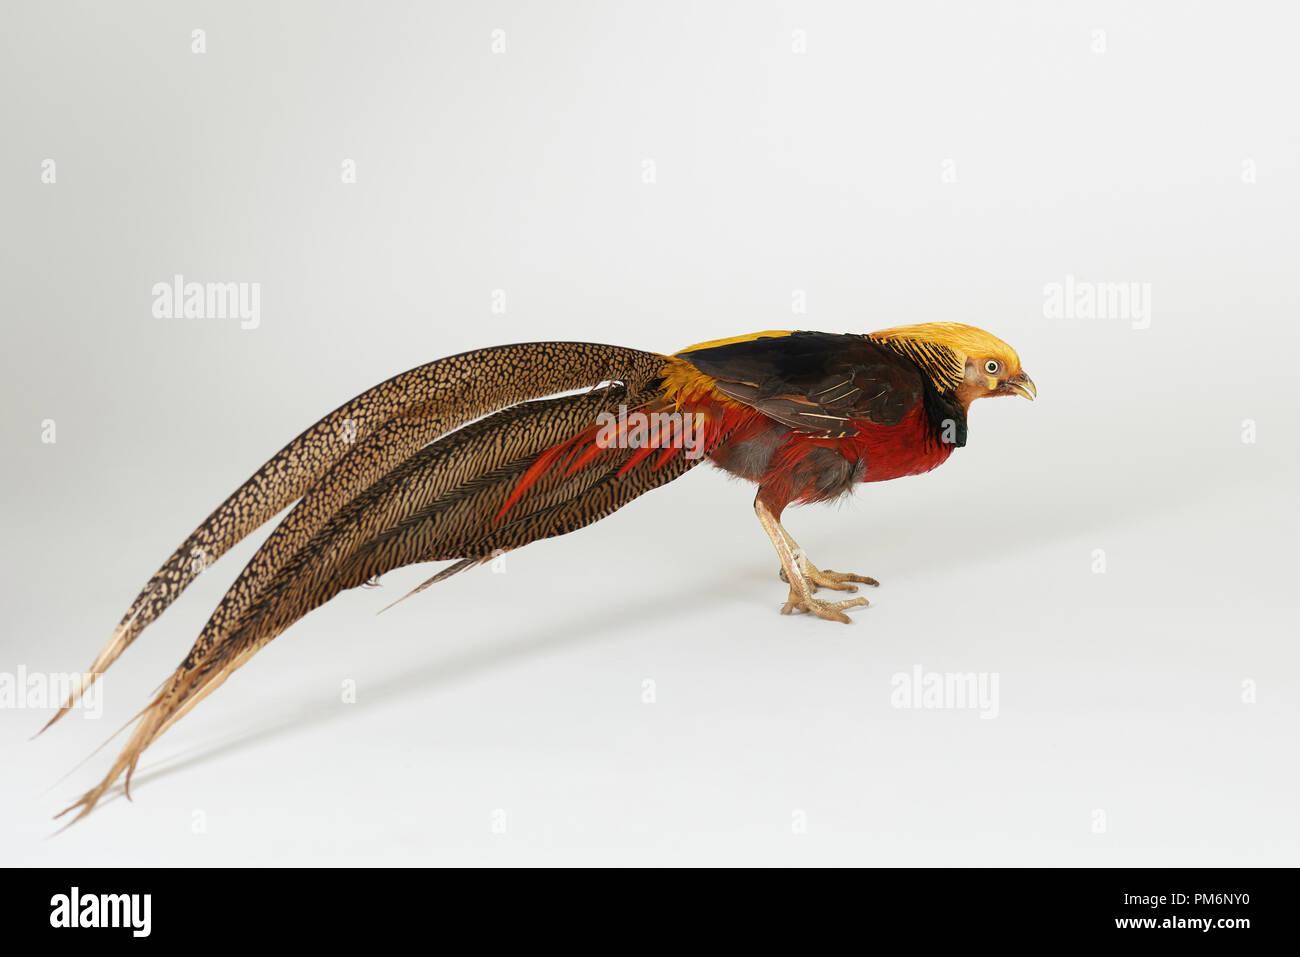 Bright colorful pheasant bird isolated on white studio background - Stock Image